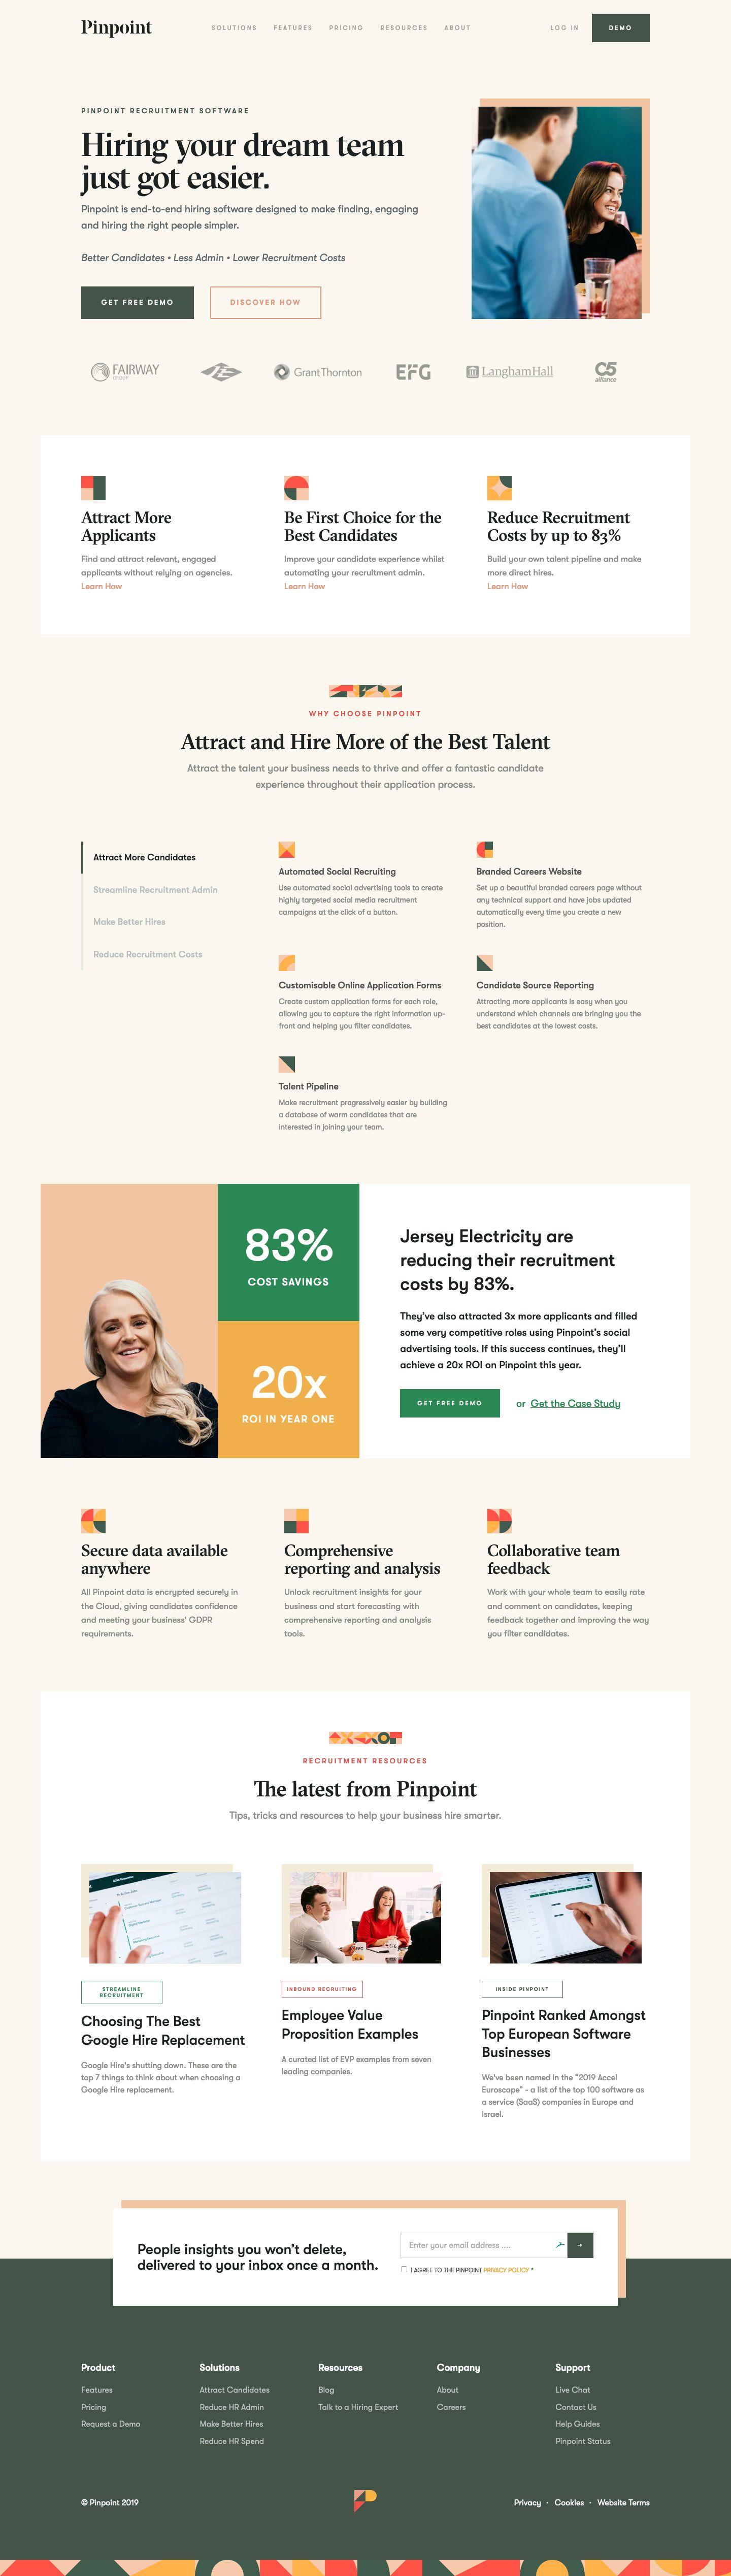 Pinpoint Landing Page Design Inspiration Lapa Ninja In 2020 Web Design Landing Page Design Page Design